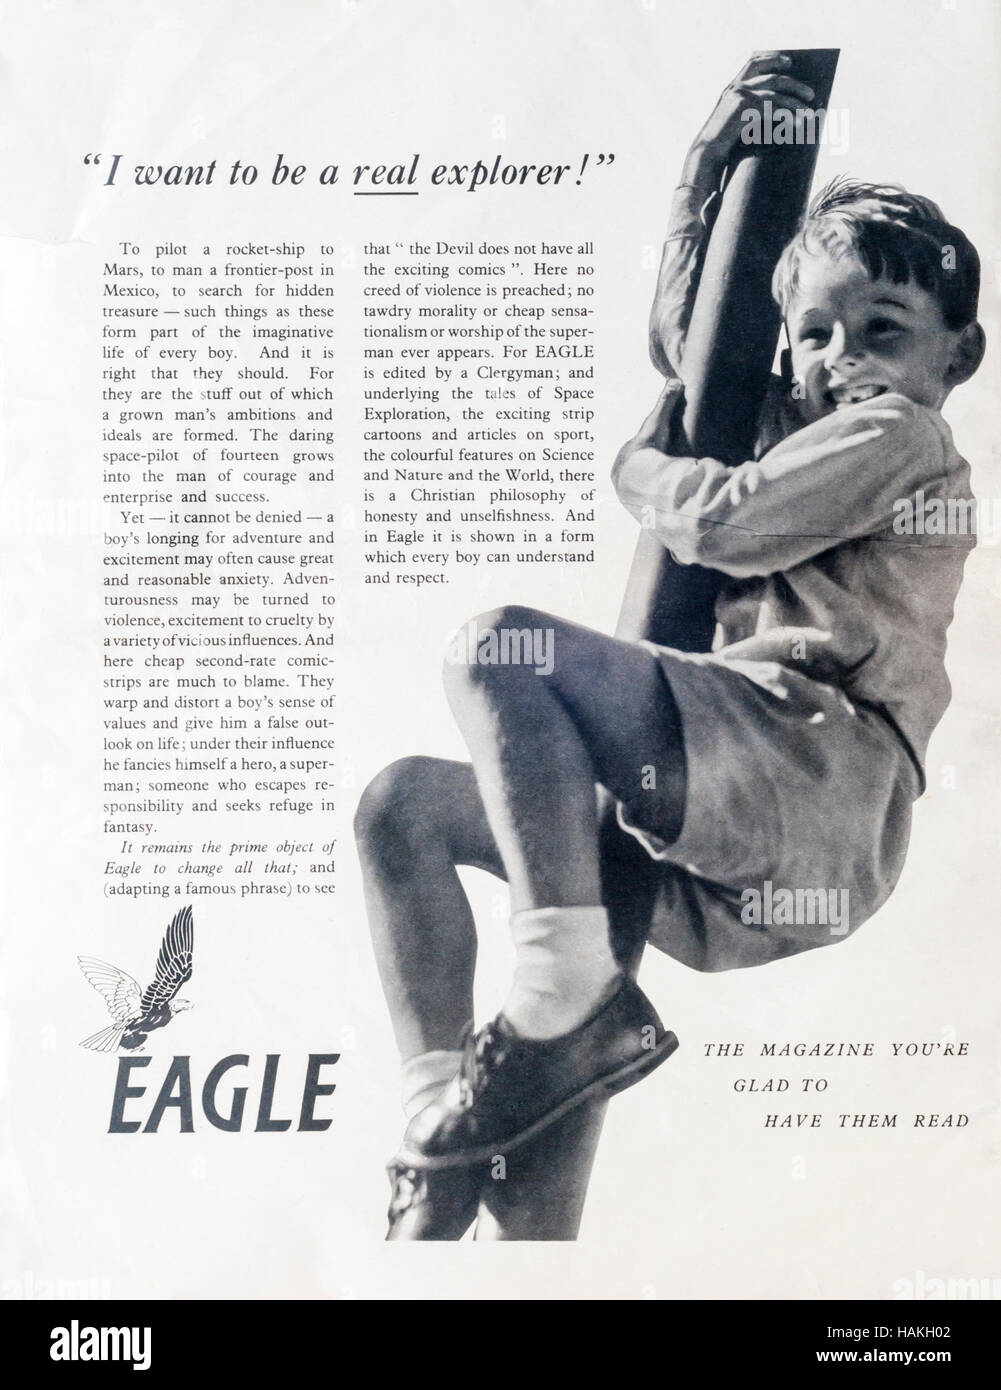 1950s magazine advertisement advertising the Eagle children's comic. - Stock Image